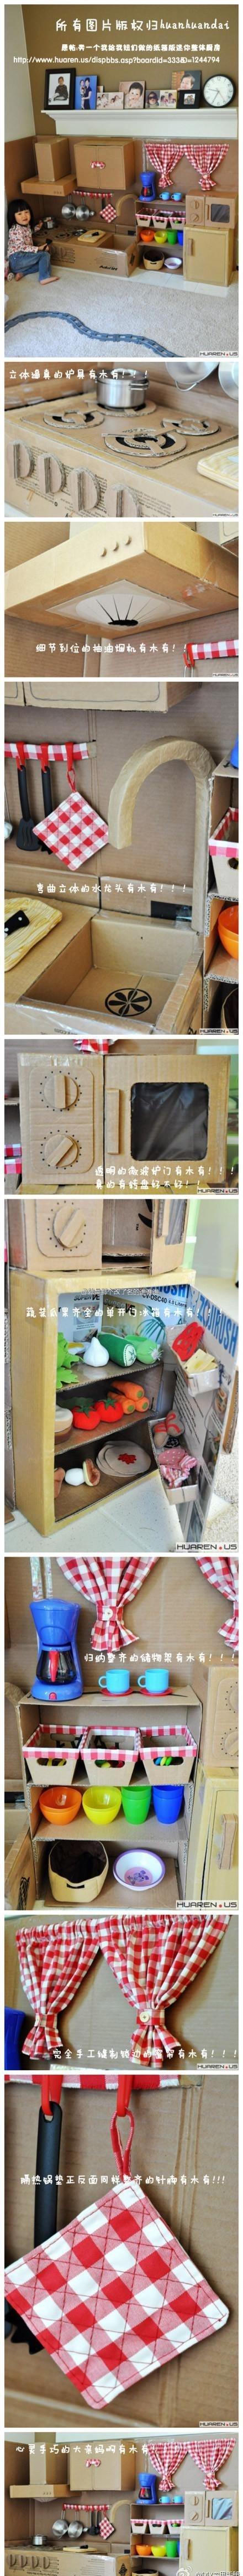 Girls - play kitchen cardboard DIY